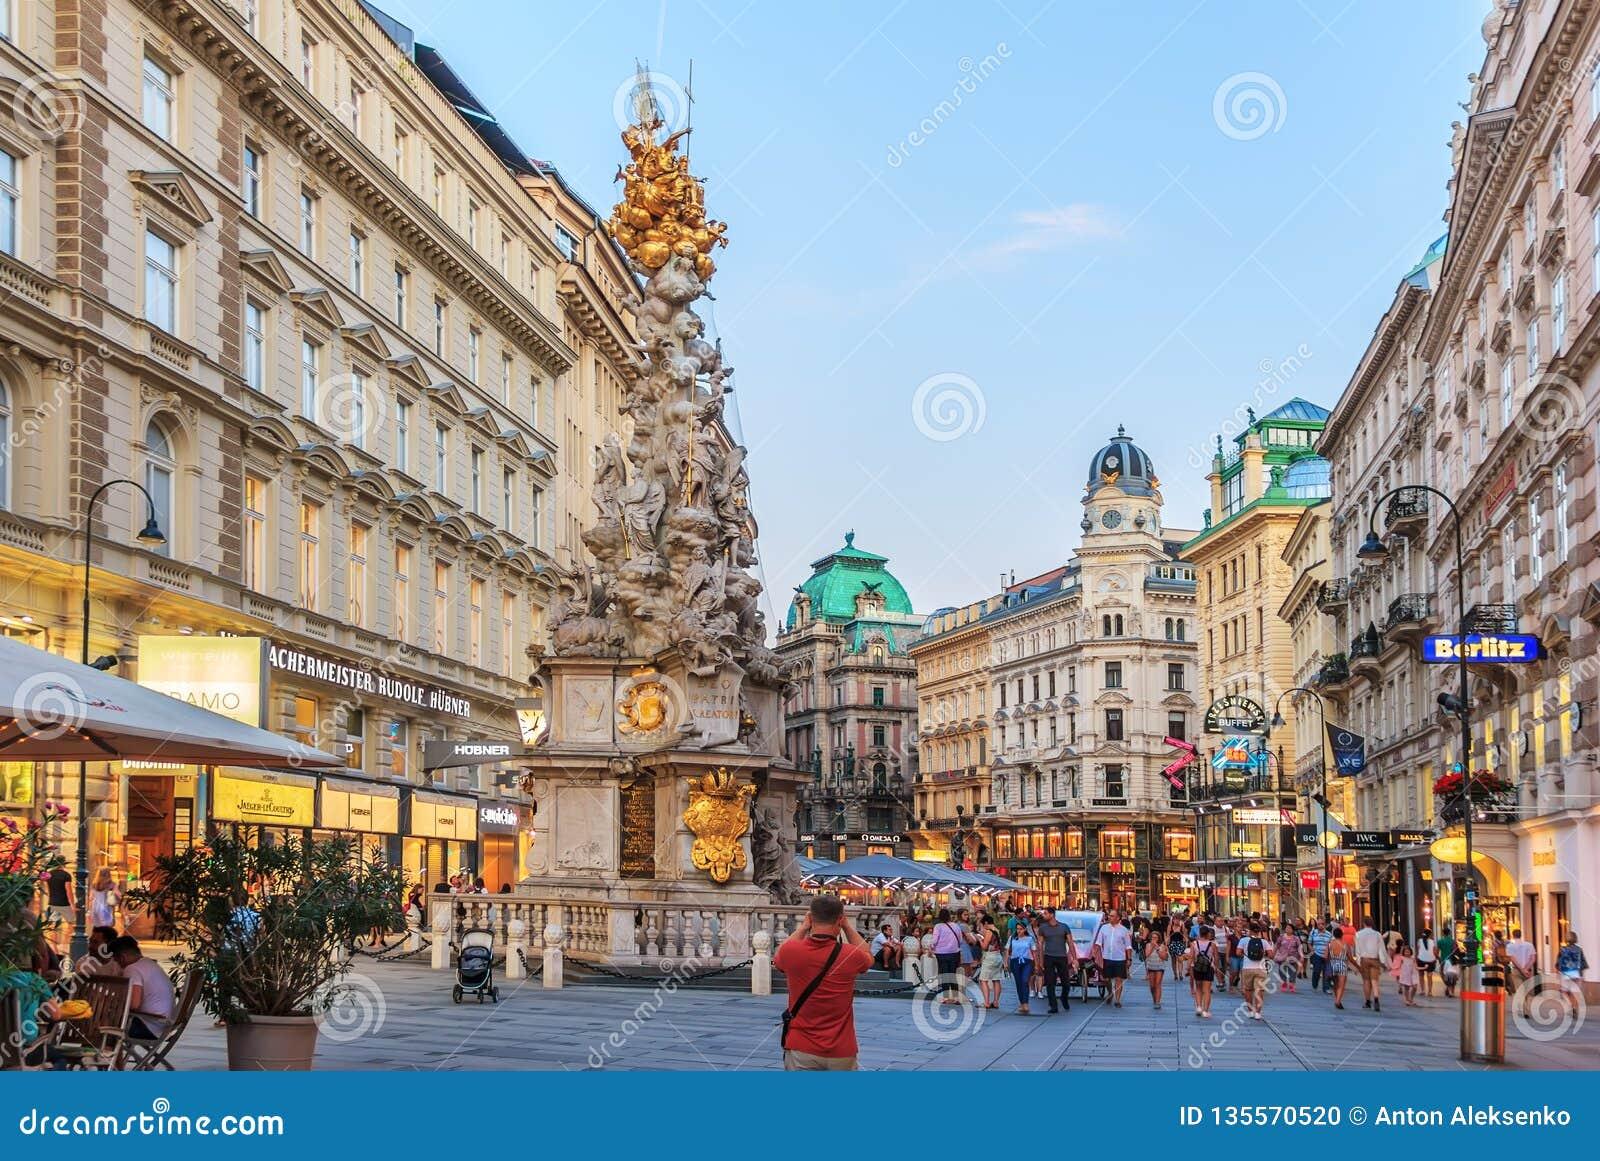 Viena, Áustria - 19 de agosto de 2018: Graben, uma rua famosa na